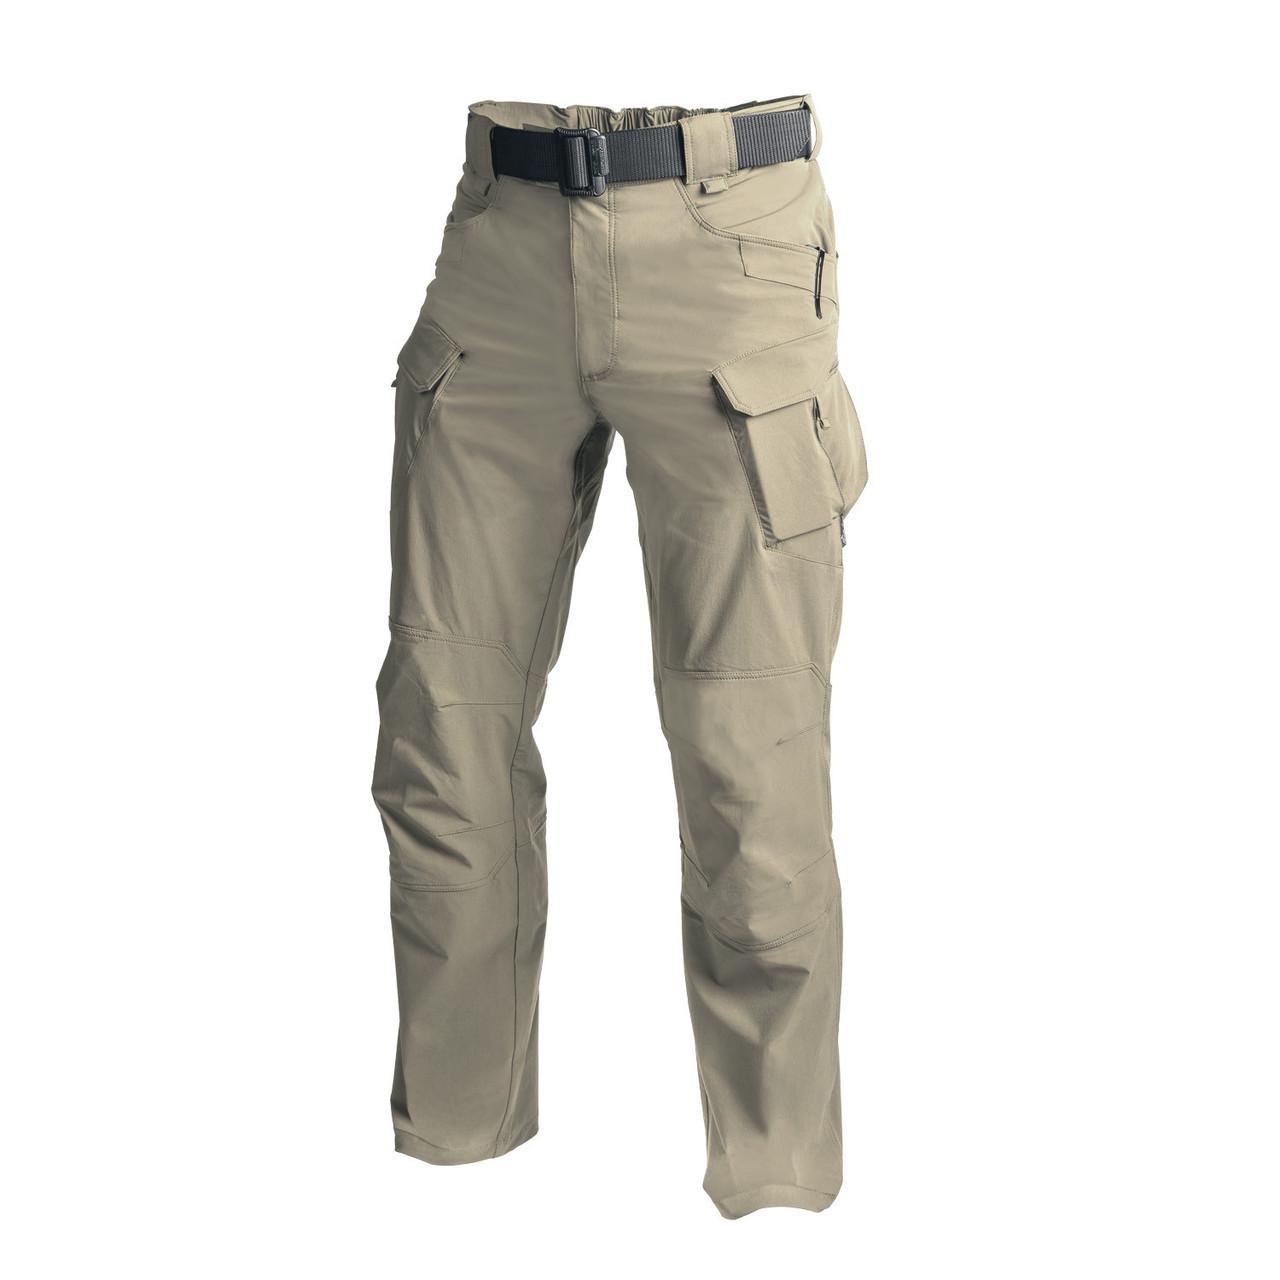 Штани тактичні Helikon - Tex, Outdoor Tactical Pants®. Новий товар. XS, Khaki